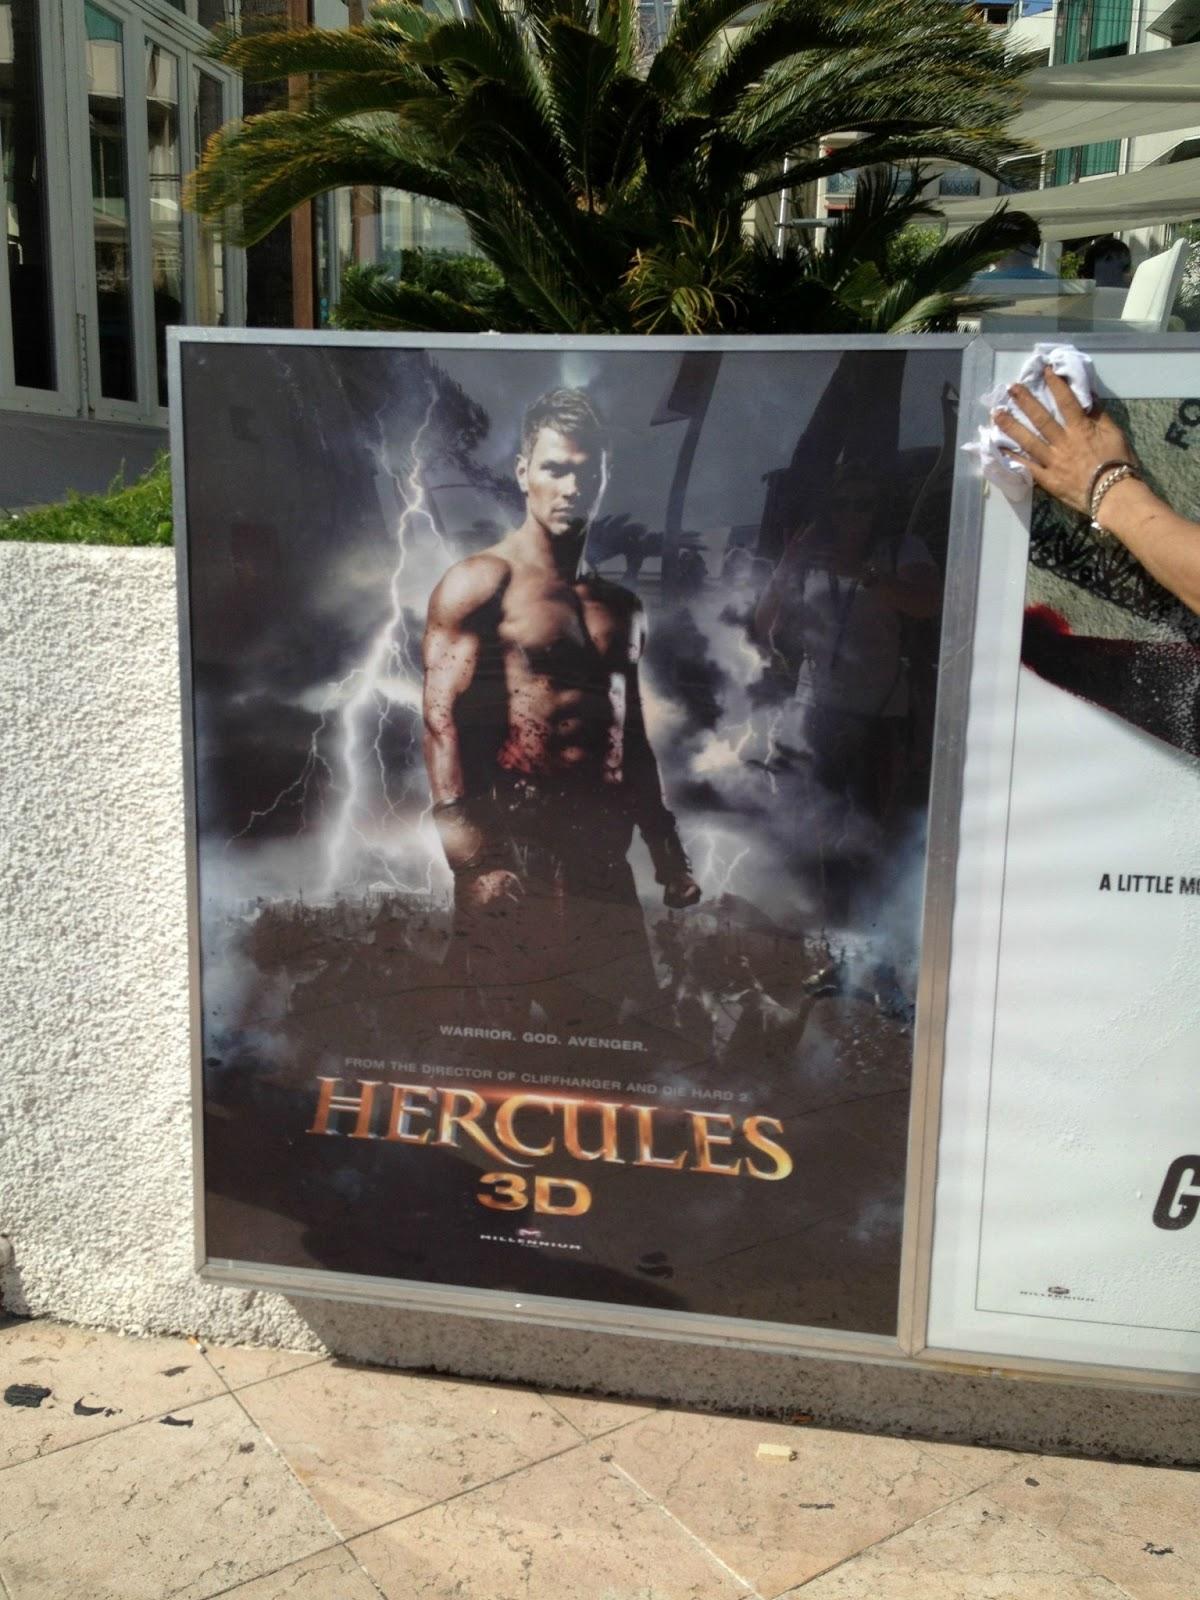 FOREVER.: Latin Banner & French Poster of Hercules 3D ... |Kellan Lutz Hercules Poster